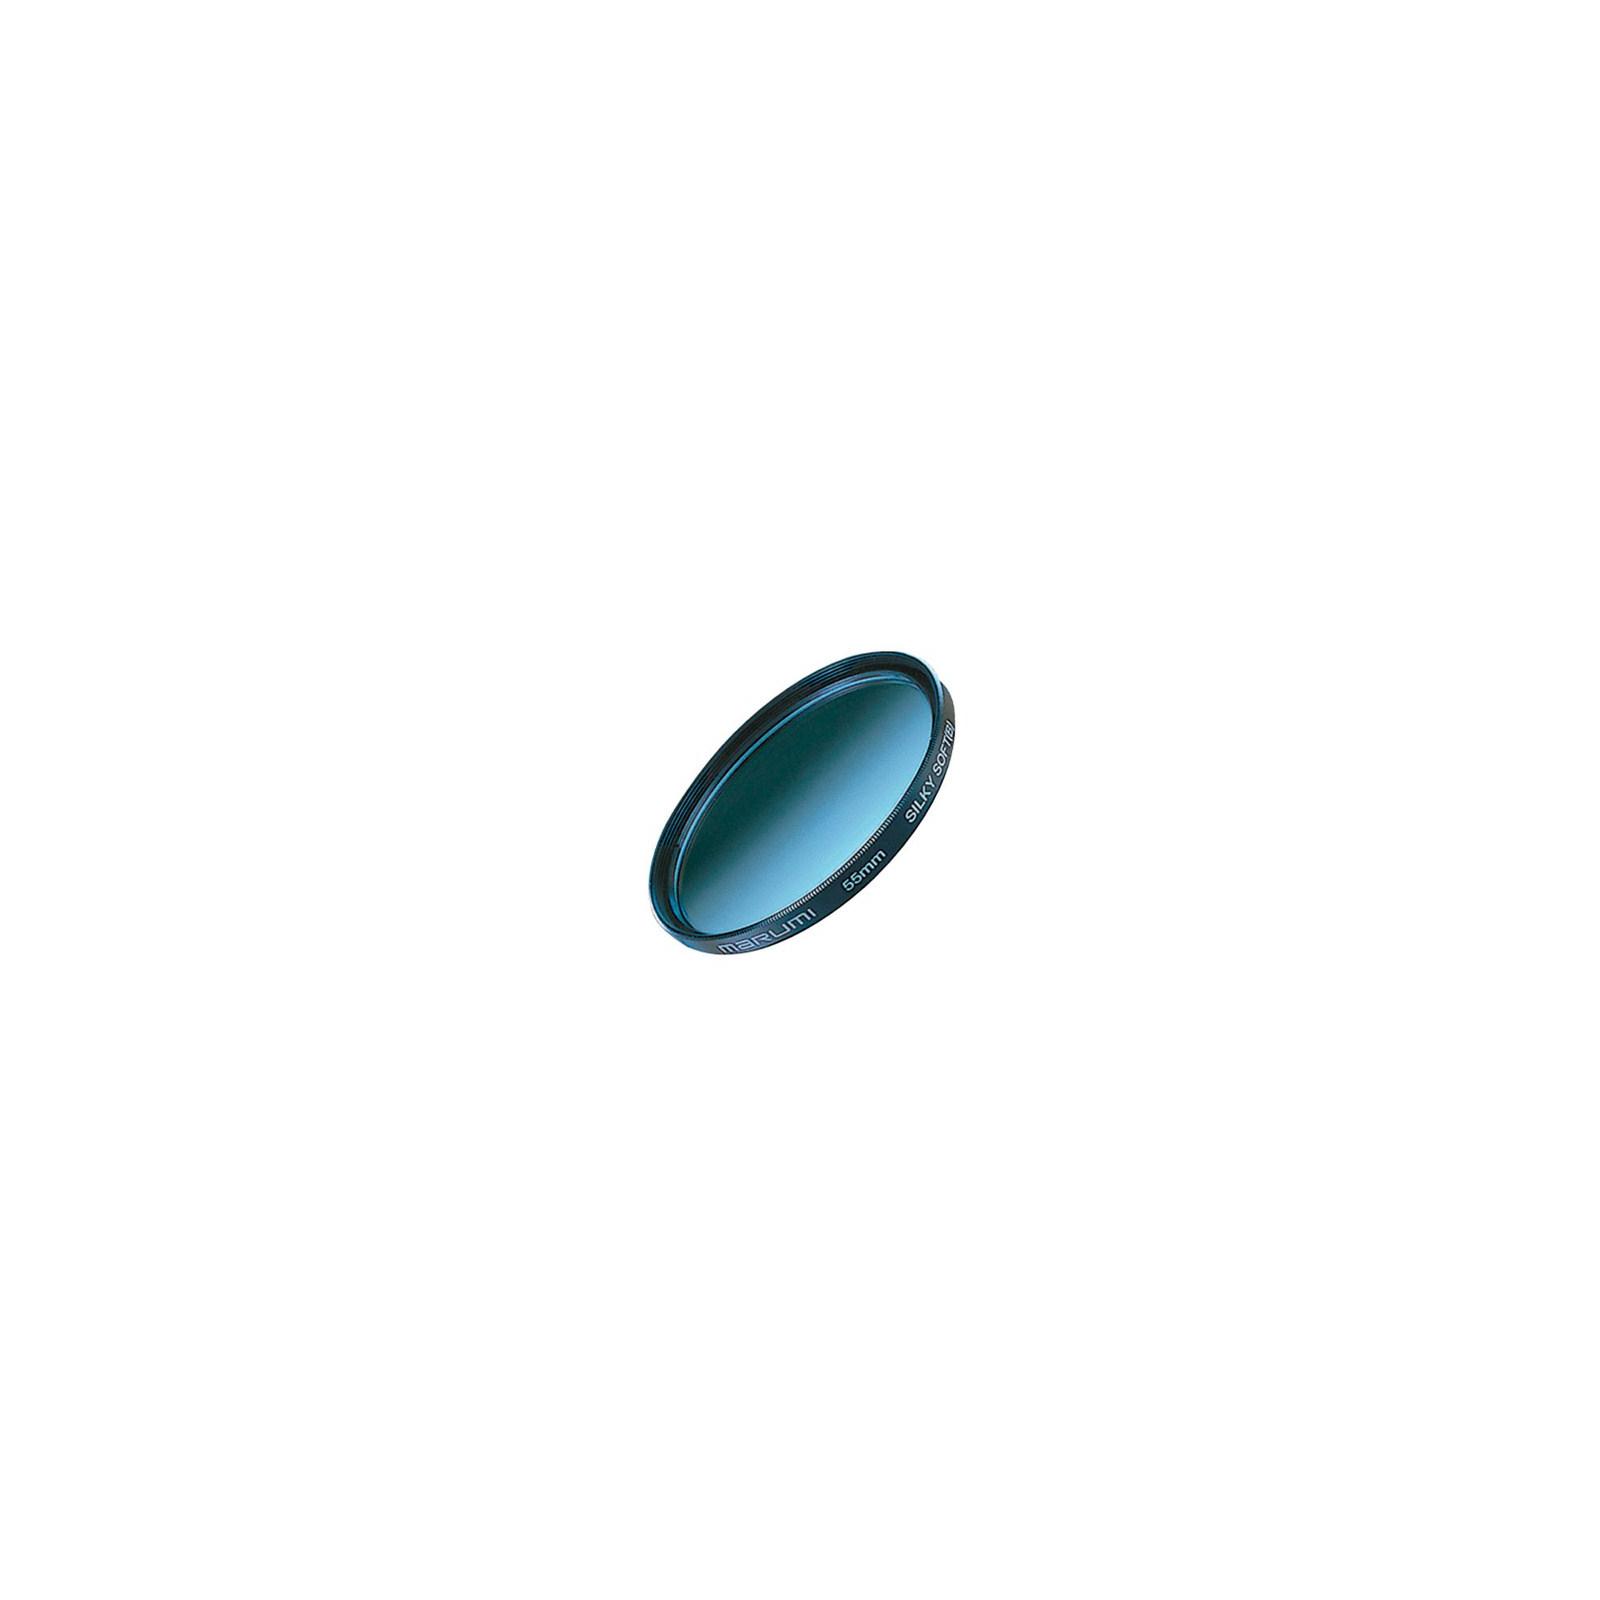 Светофильтр Marumi Silky Soft B 55mm